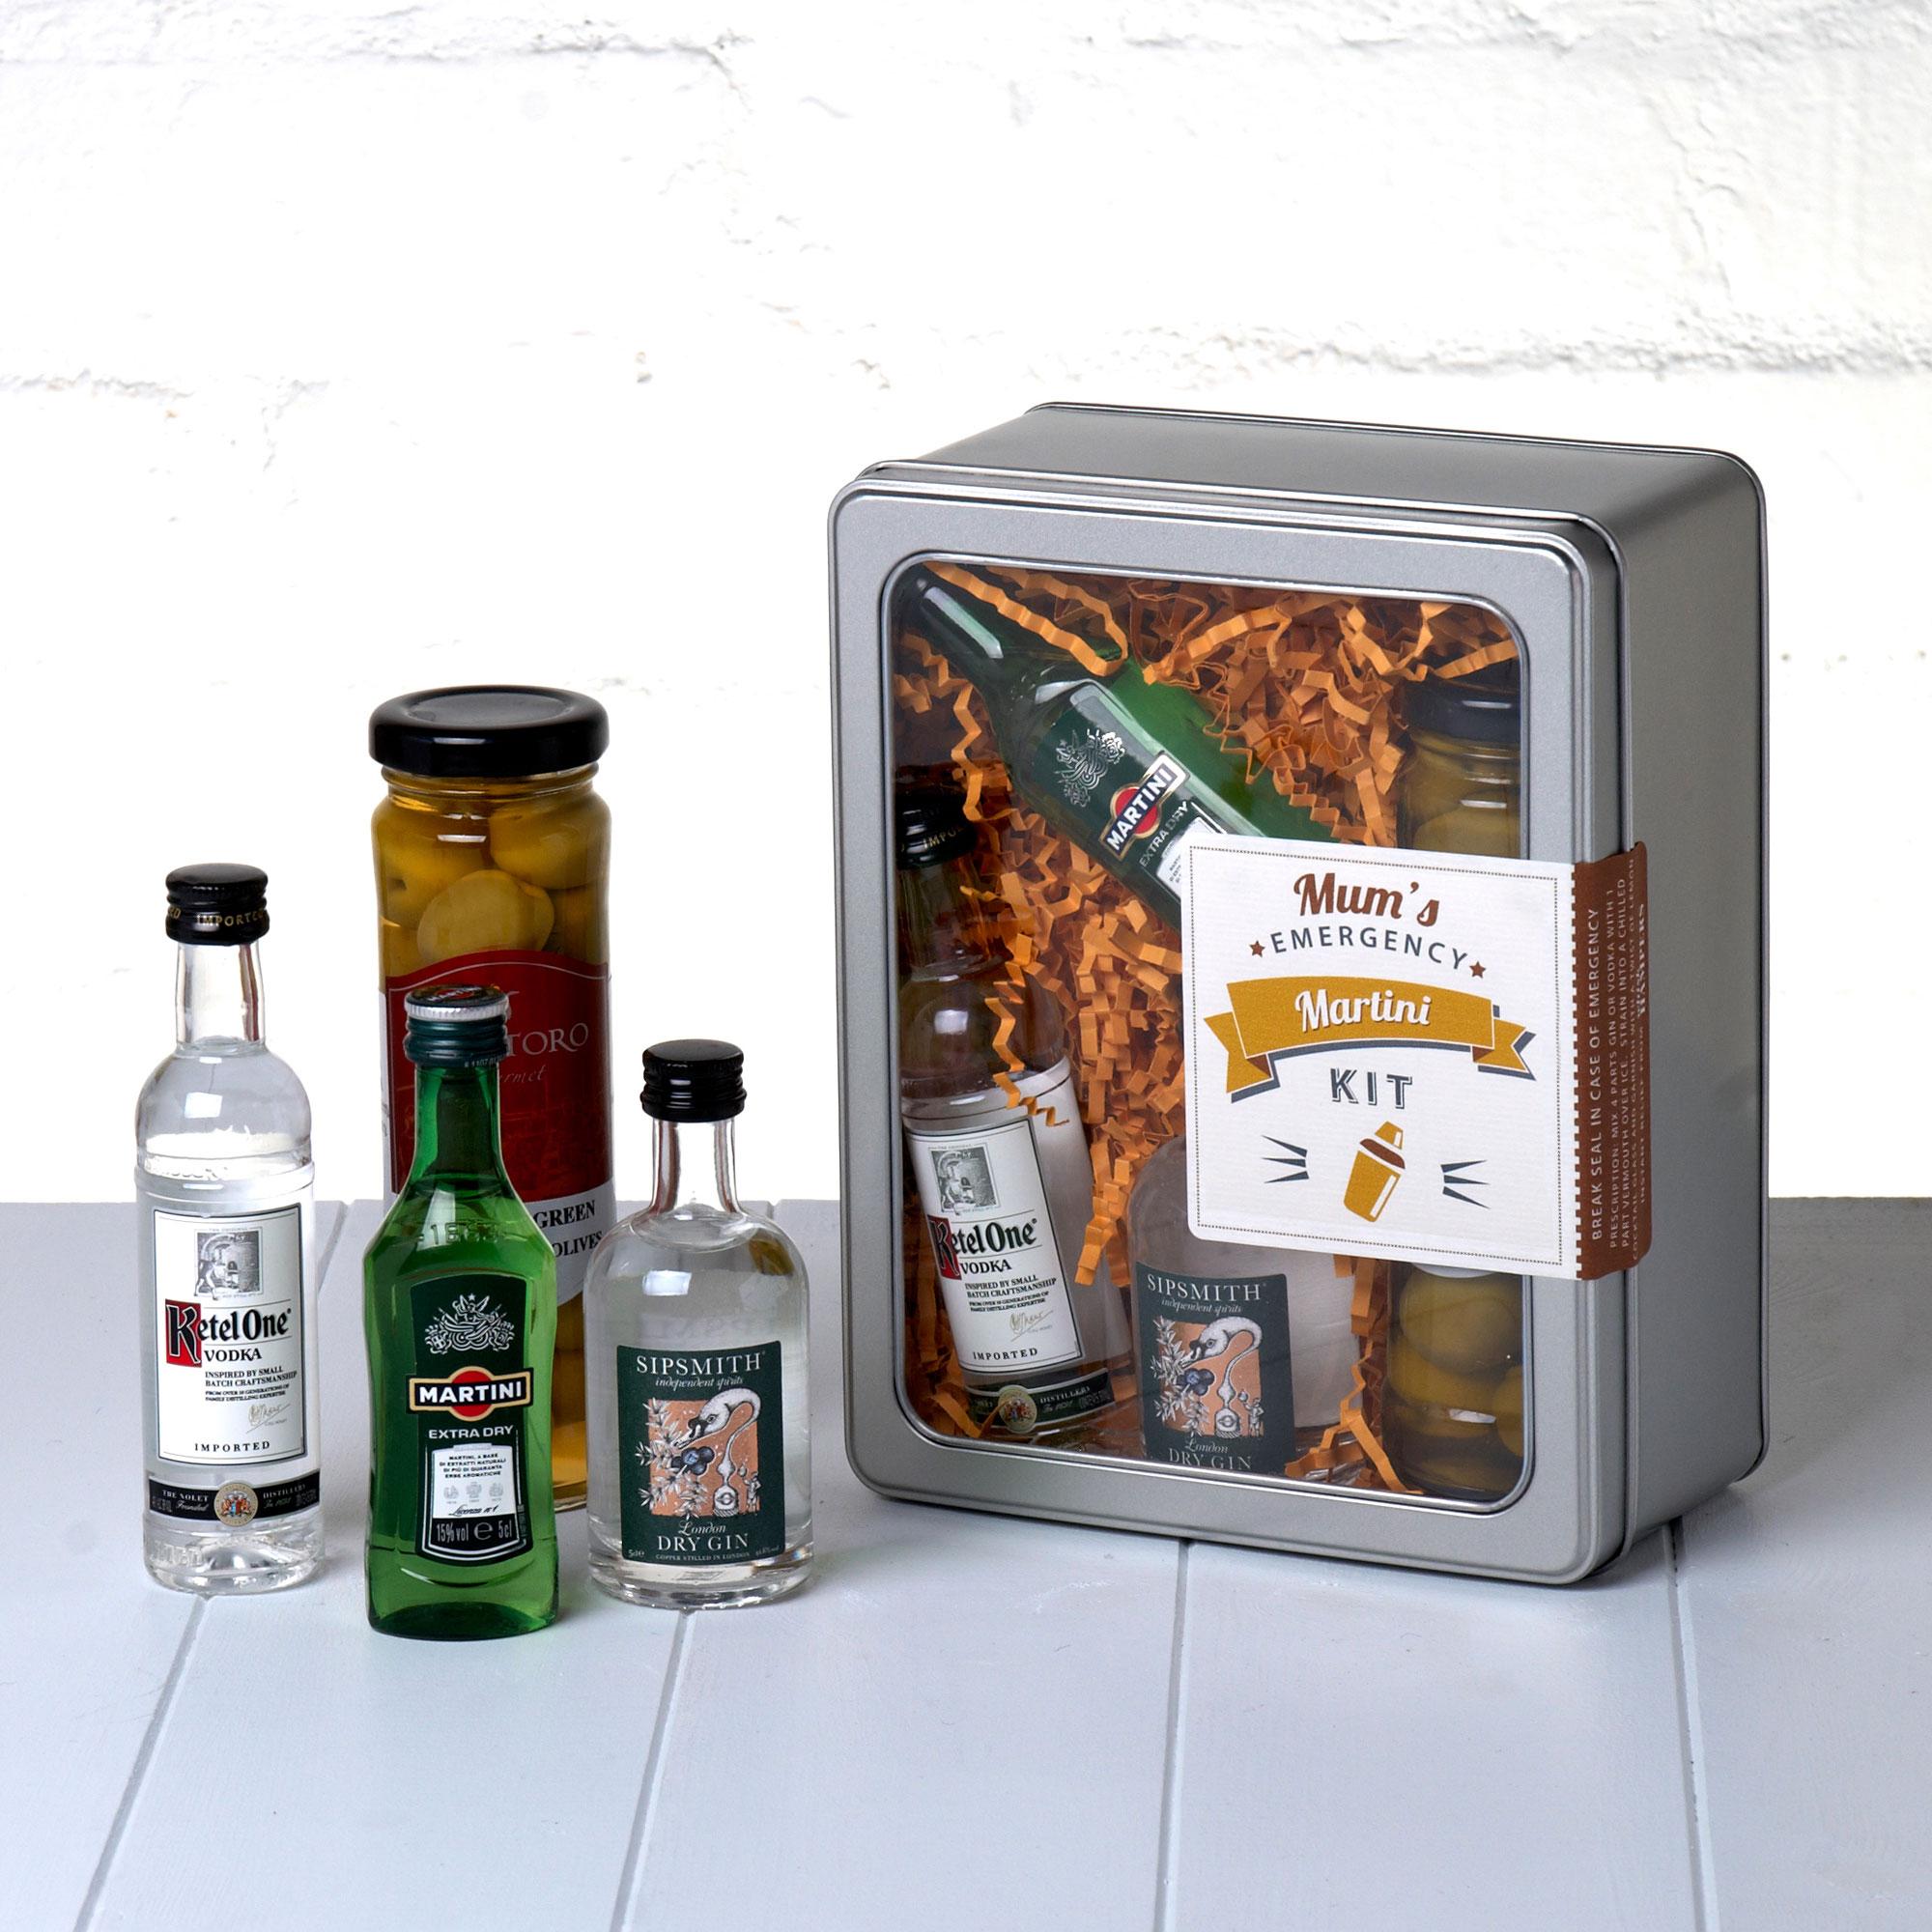 Mums Emergency Martini Kit